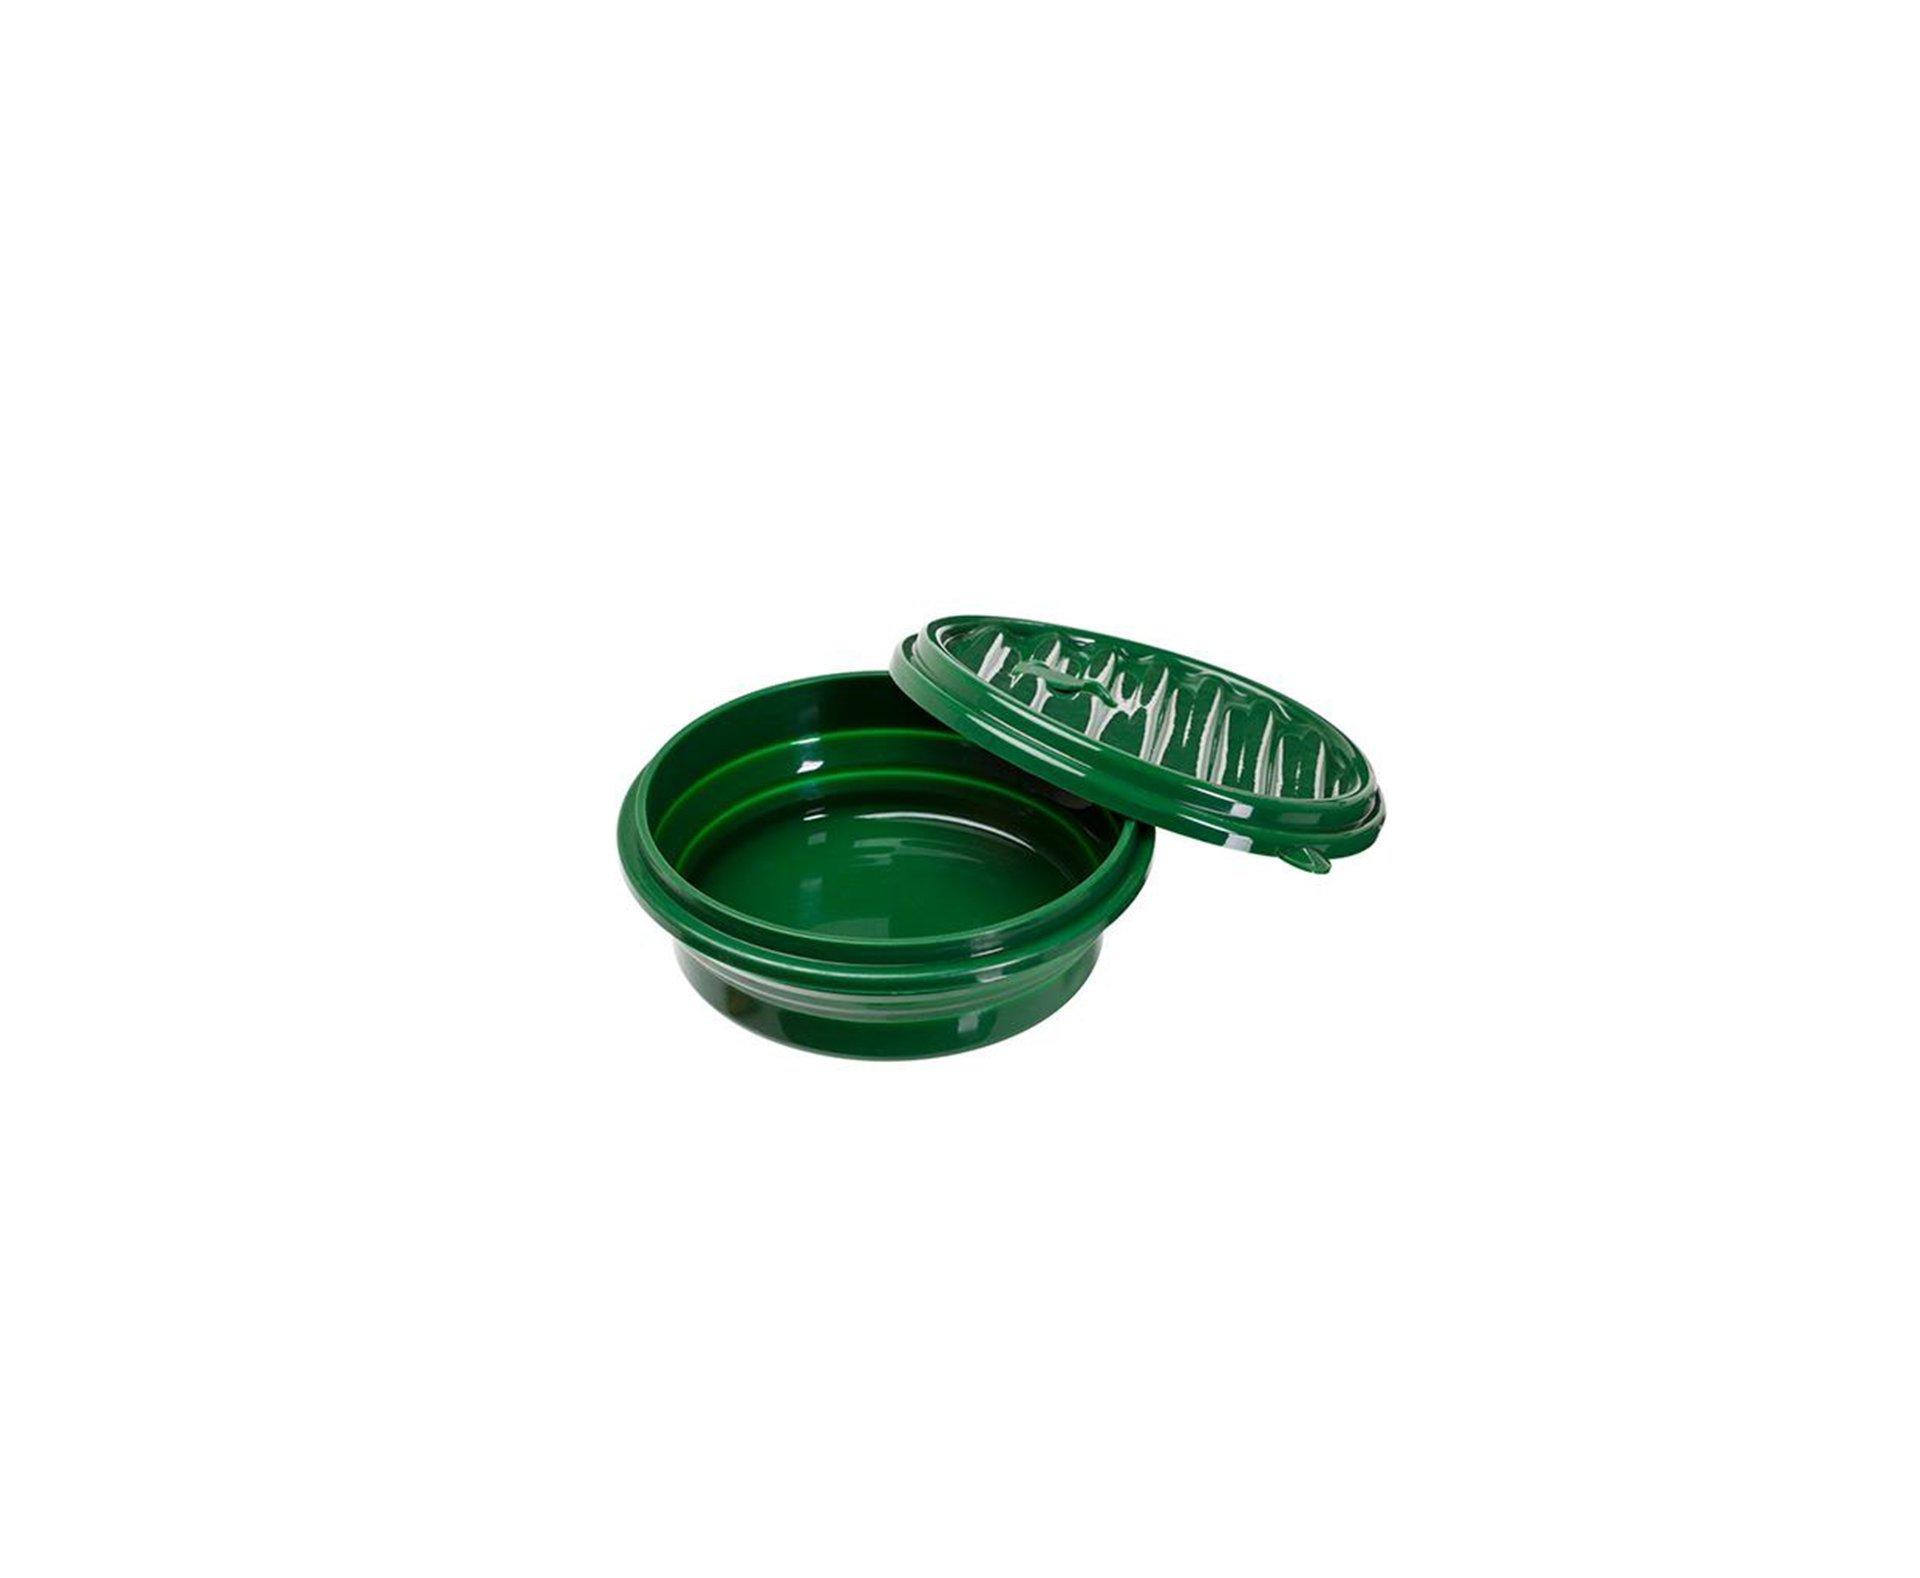 Prato/pote Silic Dobrável Compact - Guepardo